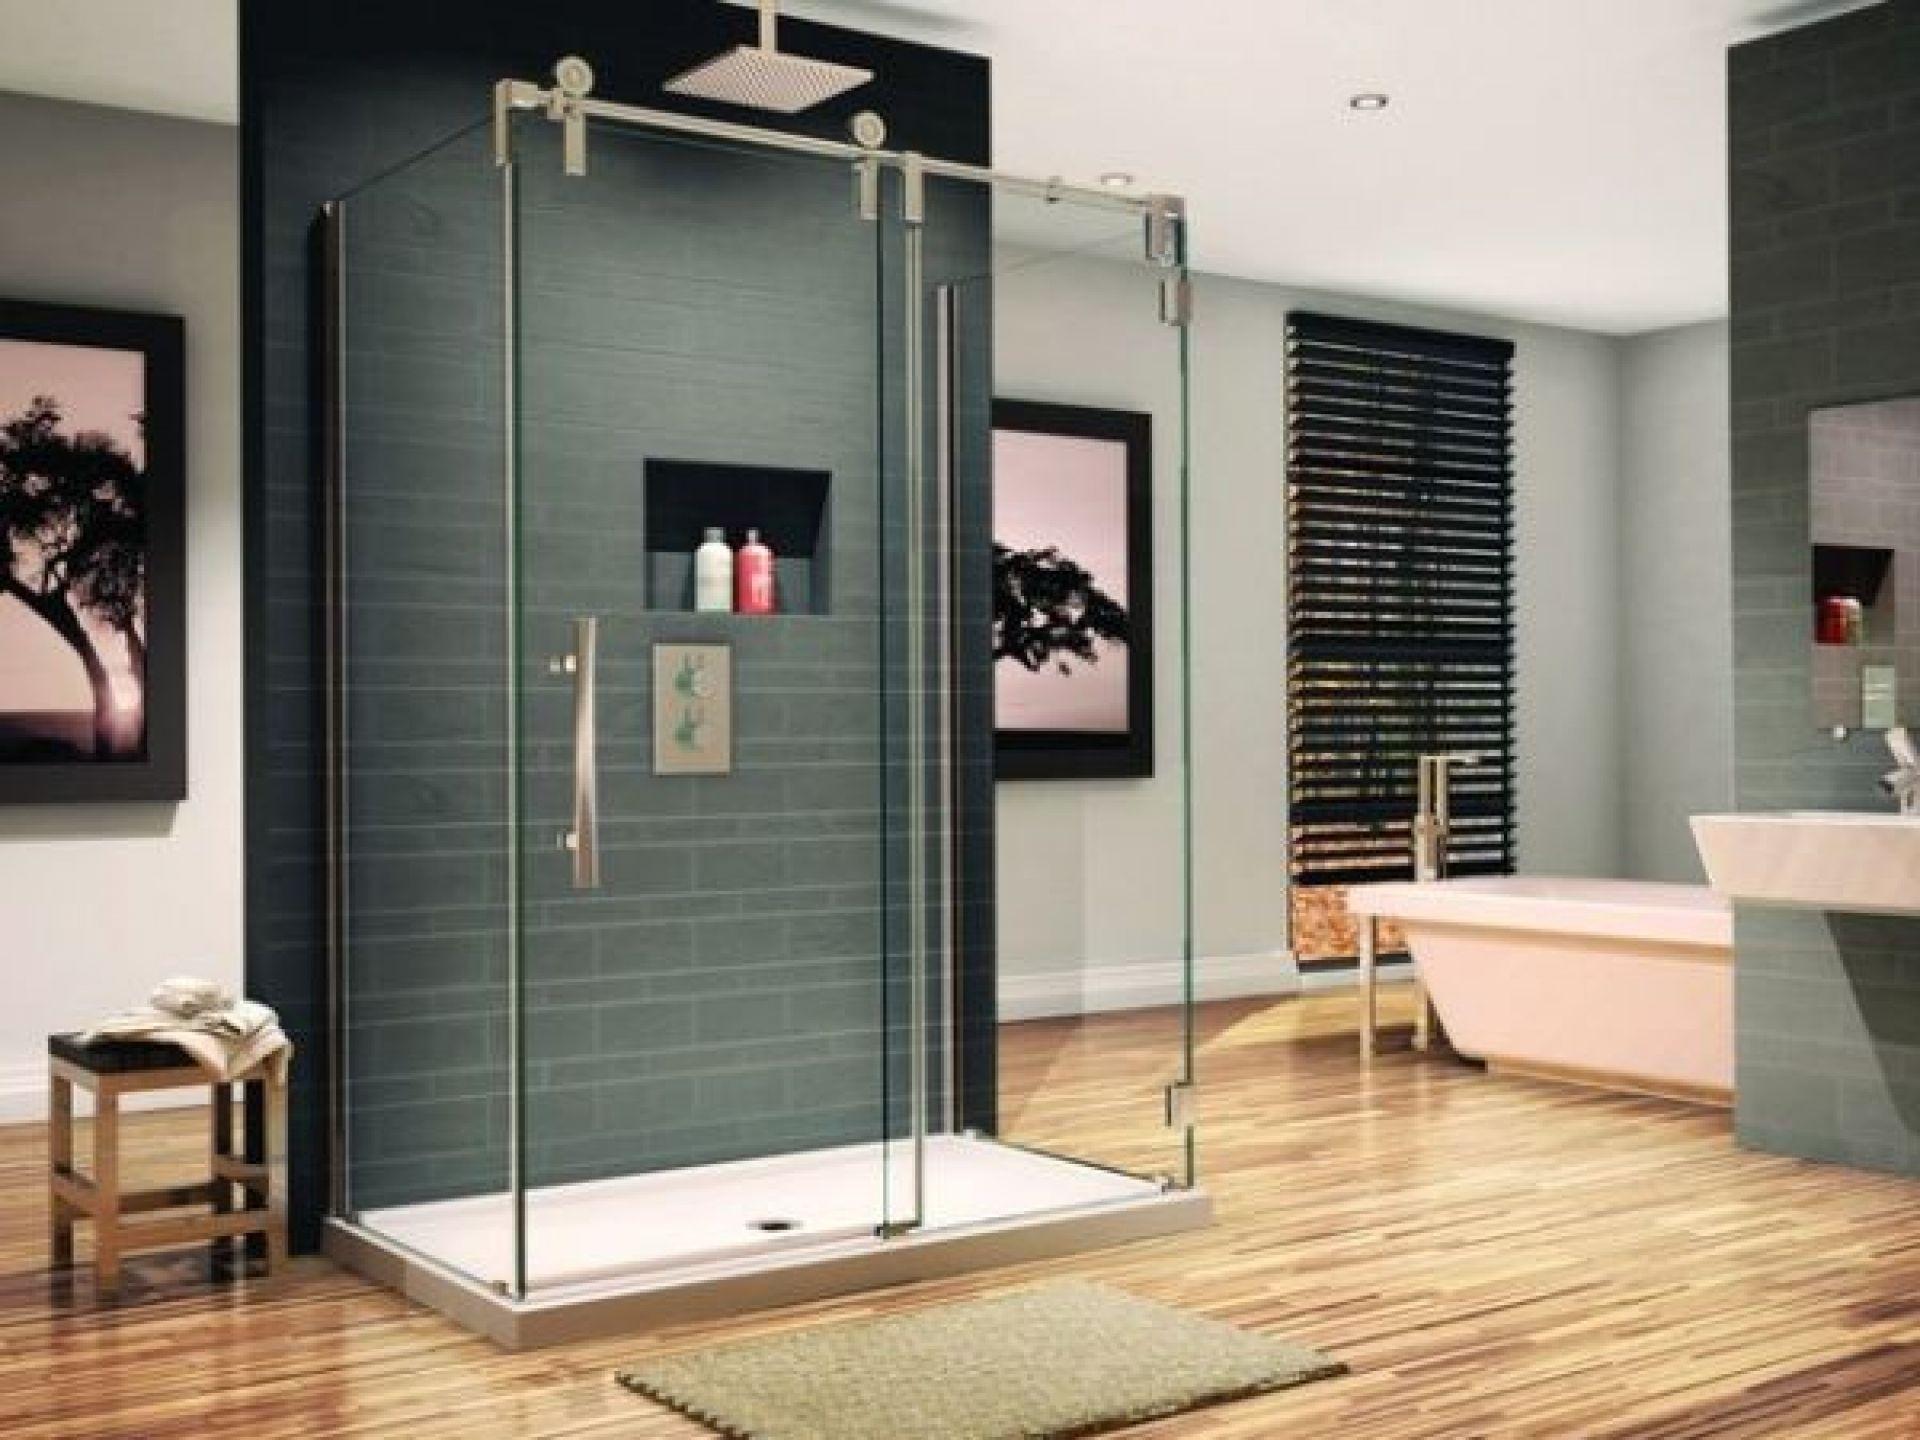 Terrific Cubicle Bathroom Shower Ideas With Rain Shower Chrome Glass Shower Enclosures Glass Shower Shower Enclosure